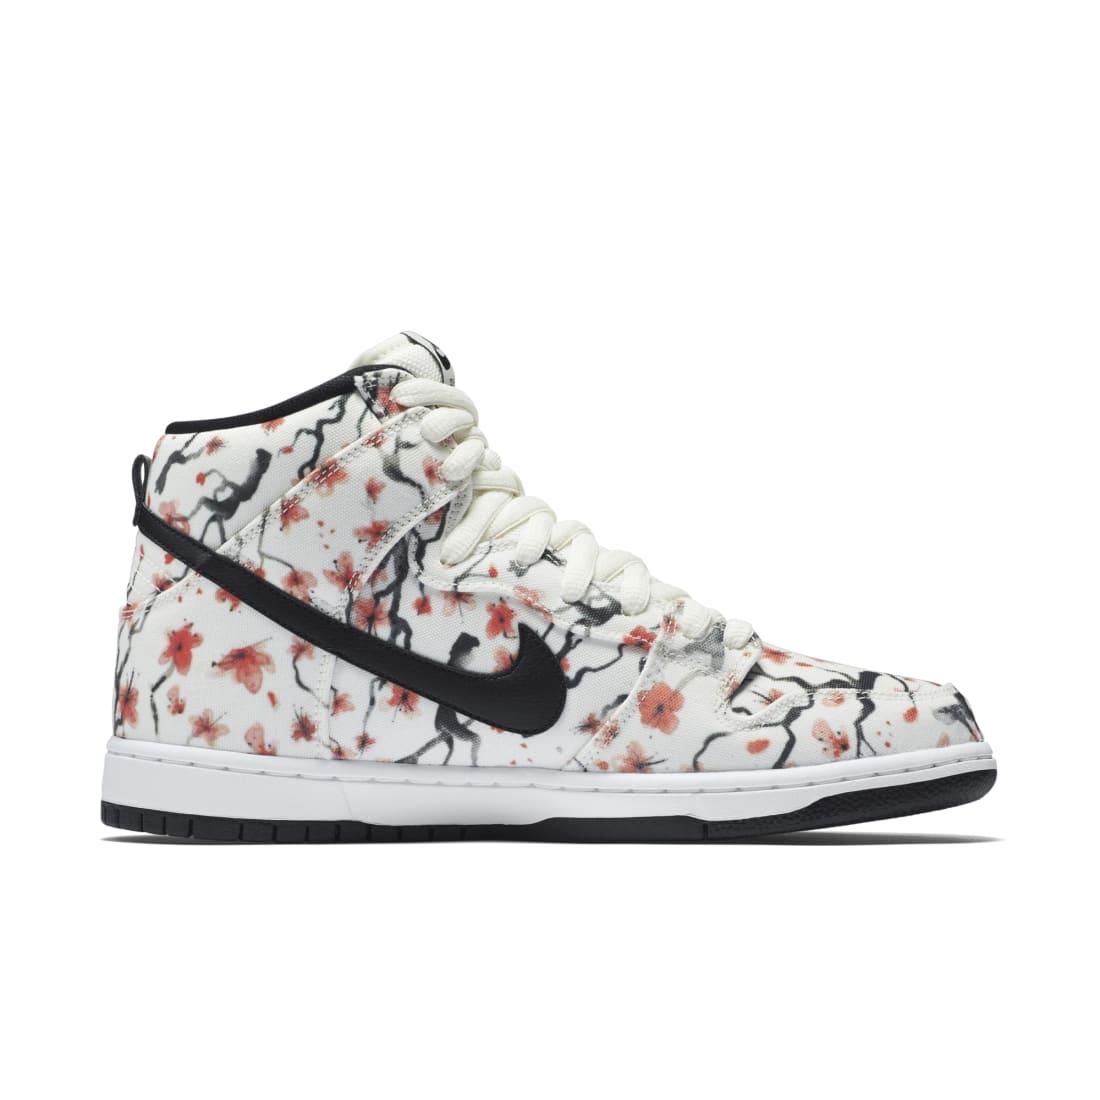 Nike Dunk Cherry Blossom